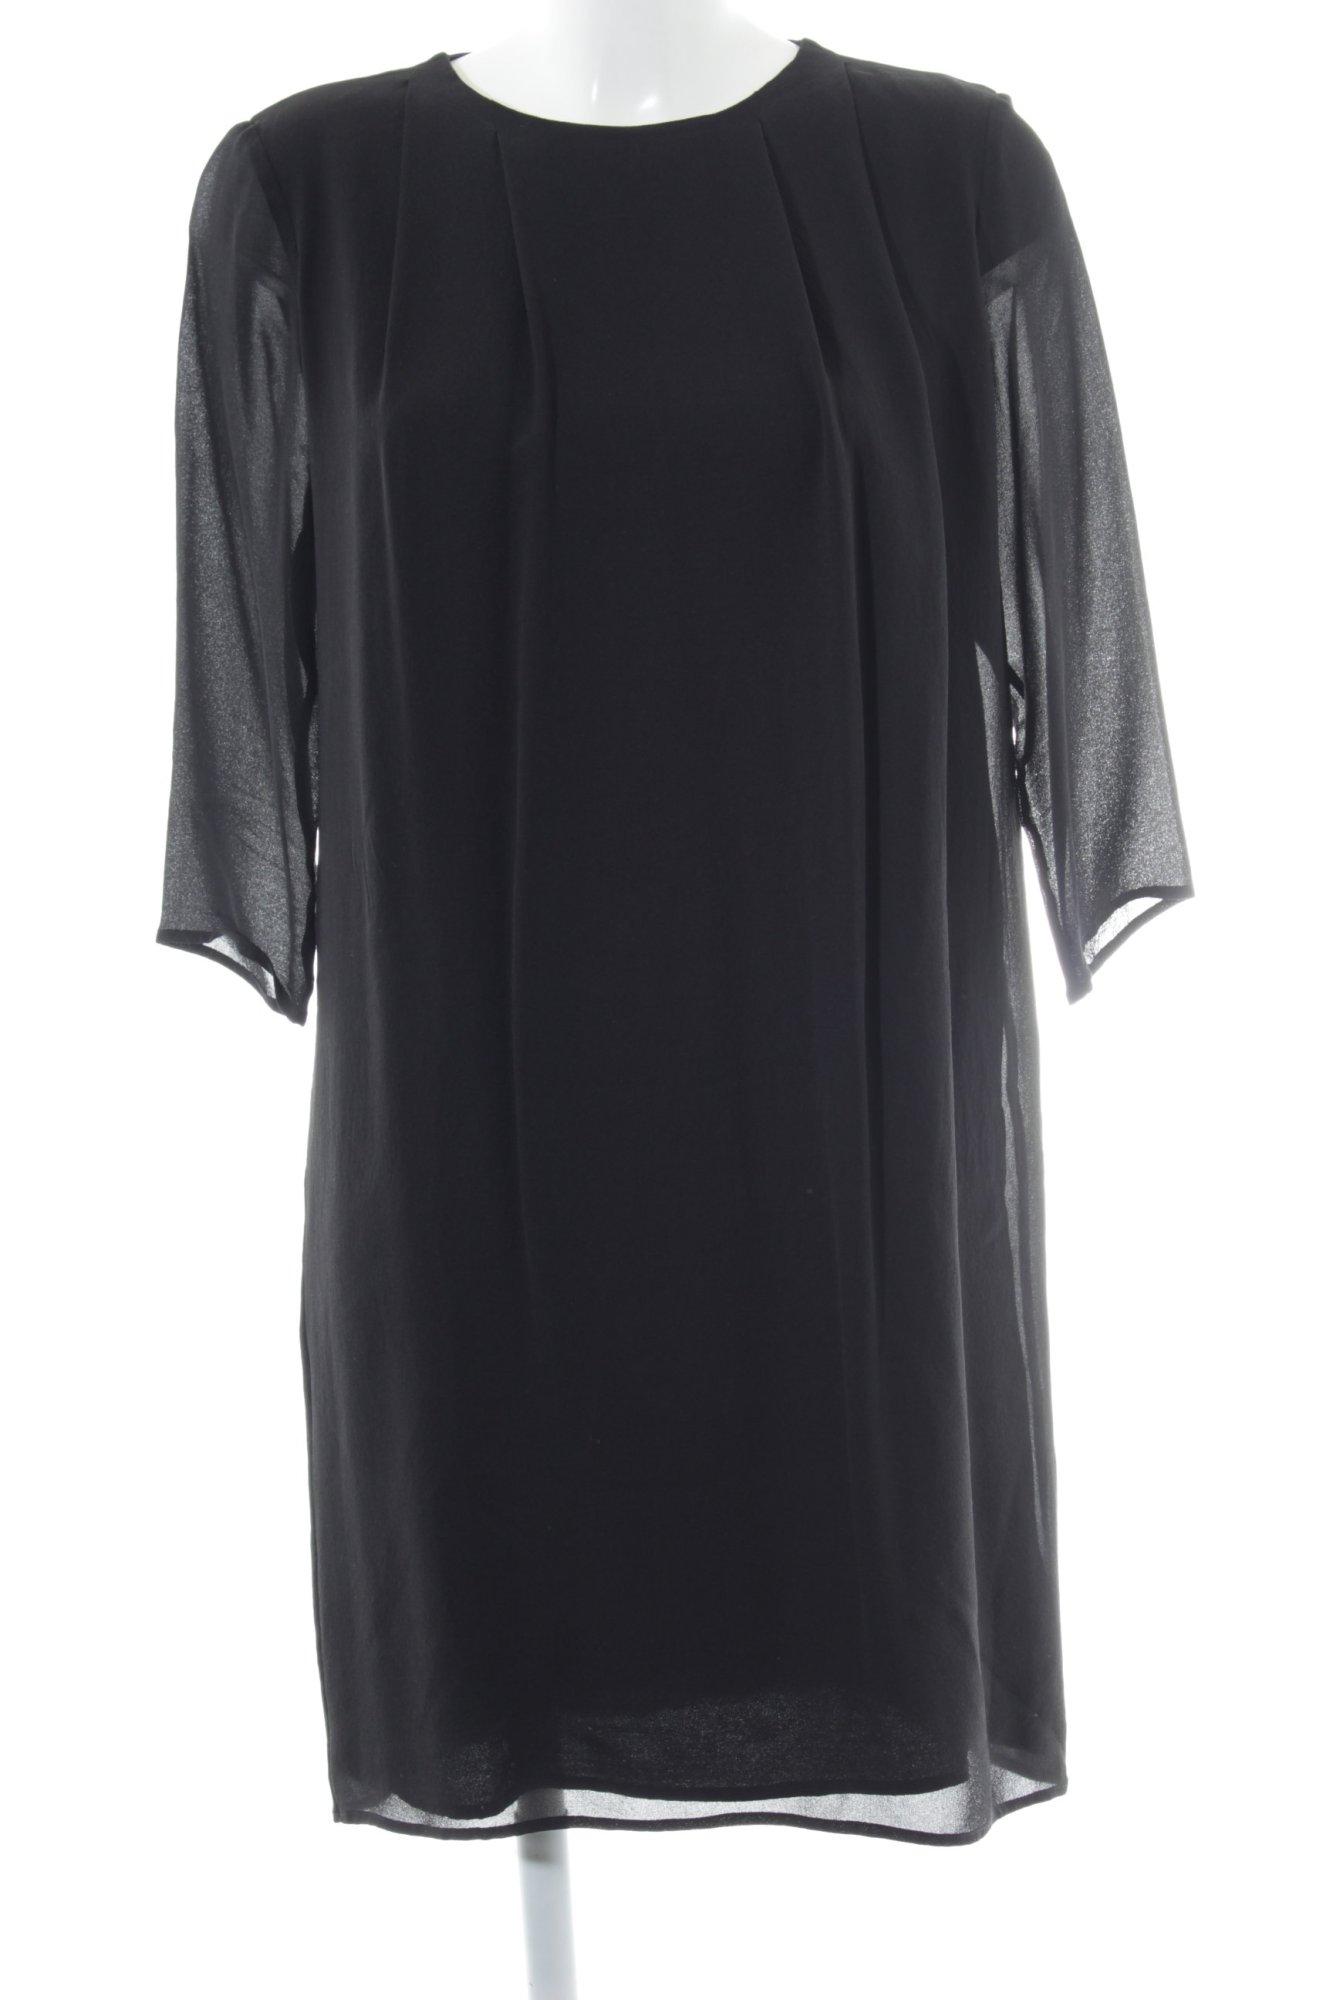 KAVIAR GAUCHE FOR ZALANDO Blausenkleid schwarz Elegant Damen Gr. DE 38 Kleid